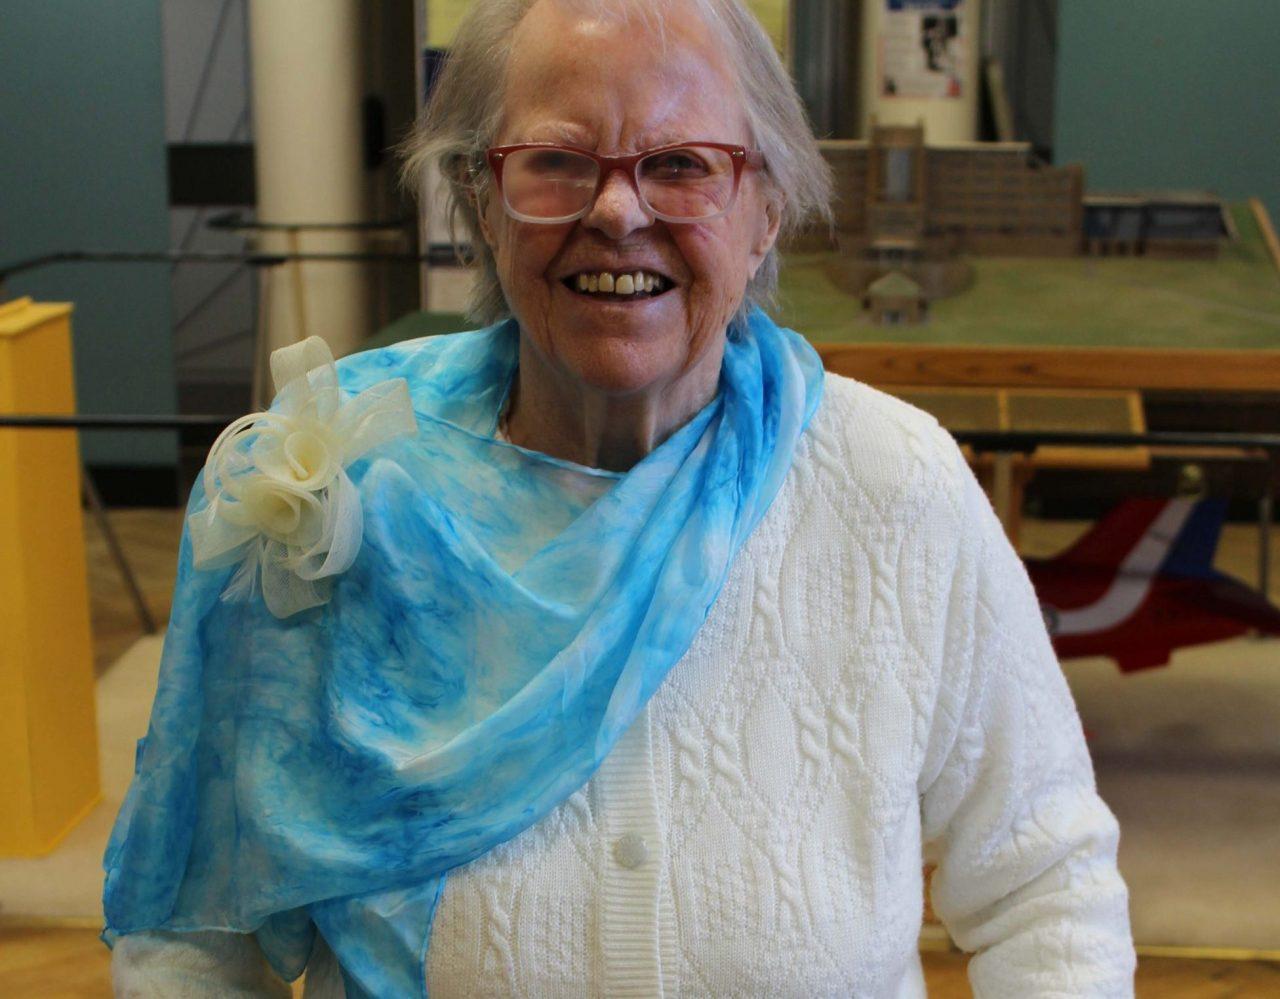 WW2 blind veteran to complete 100 lap walking challenge ahead of her 100th birthday